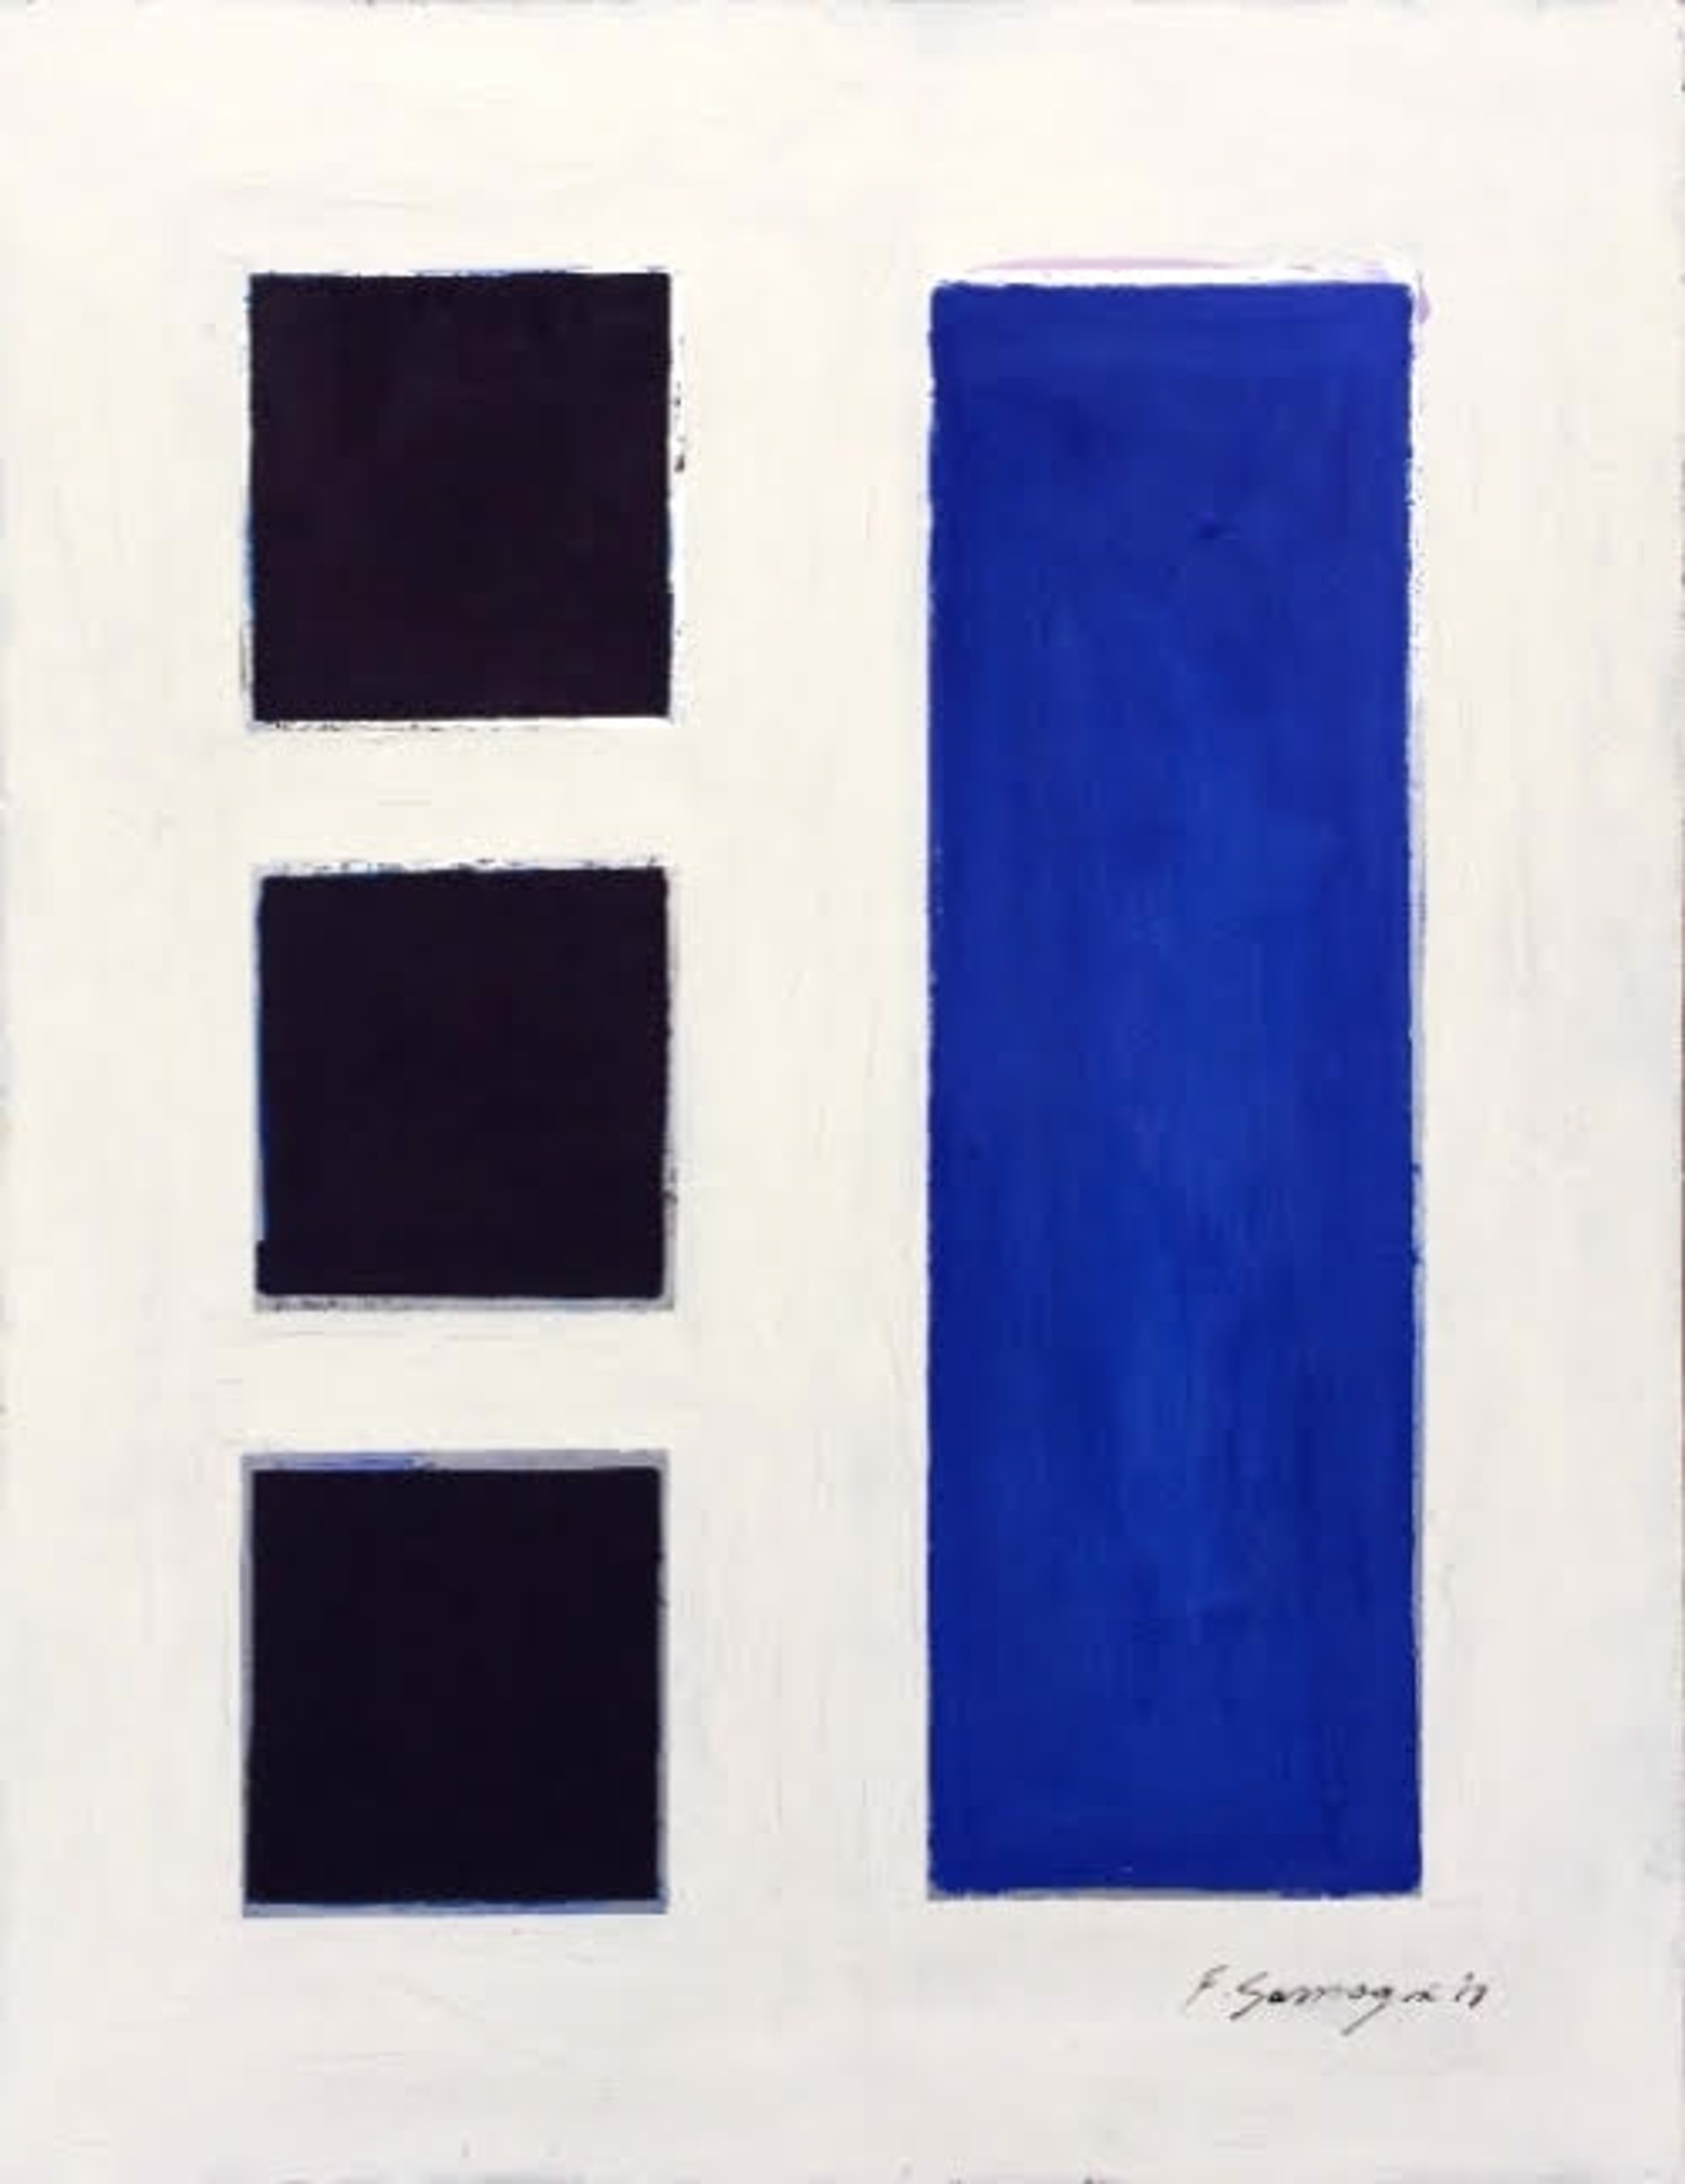 No Significance #12 (blue squares  / white background) by Fabio Sanzogni